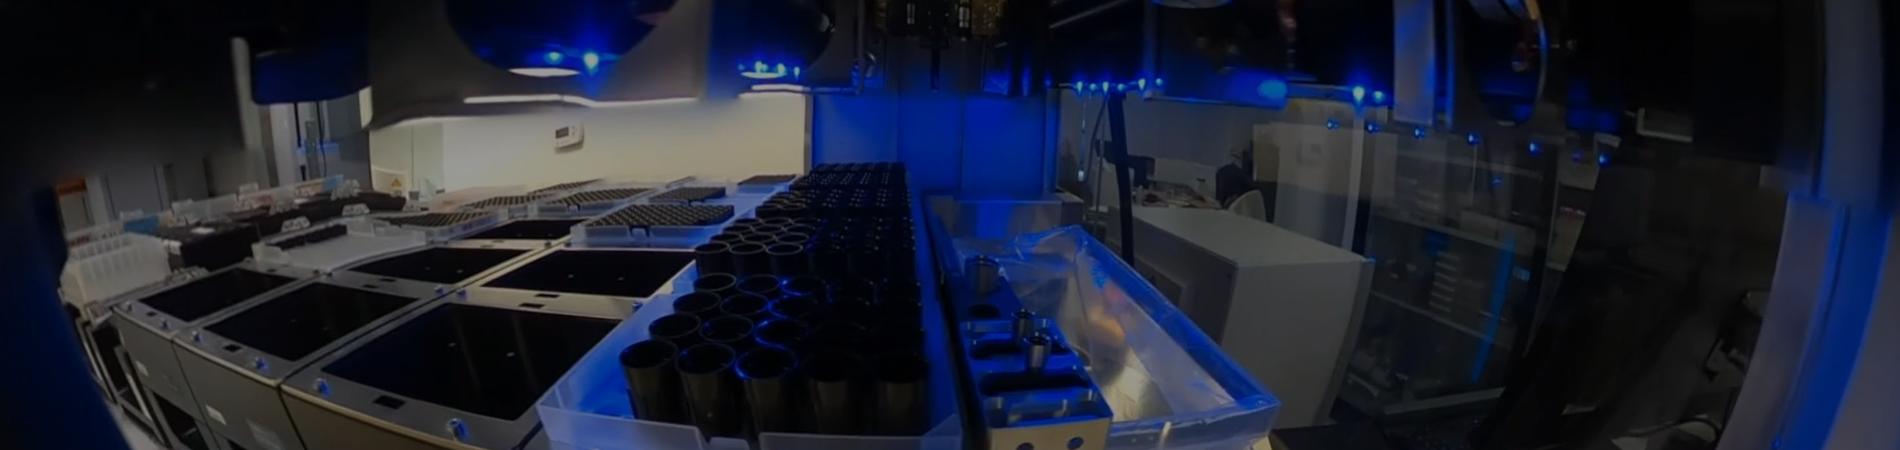 Lab Automation Hardware